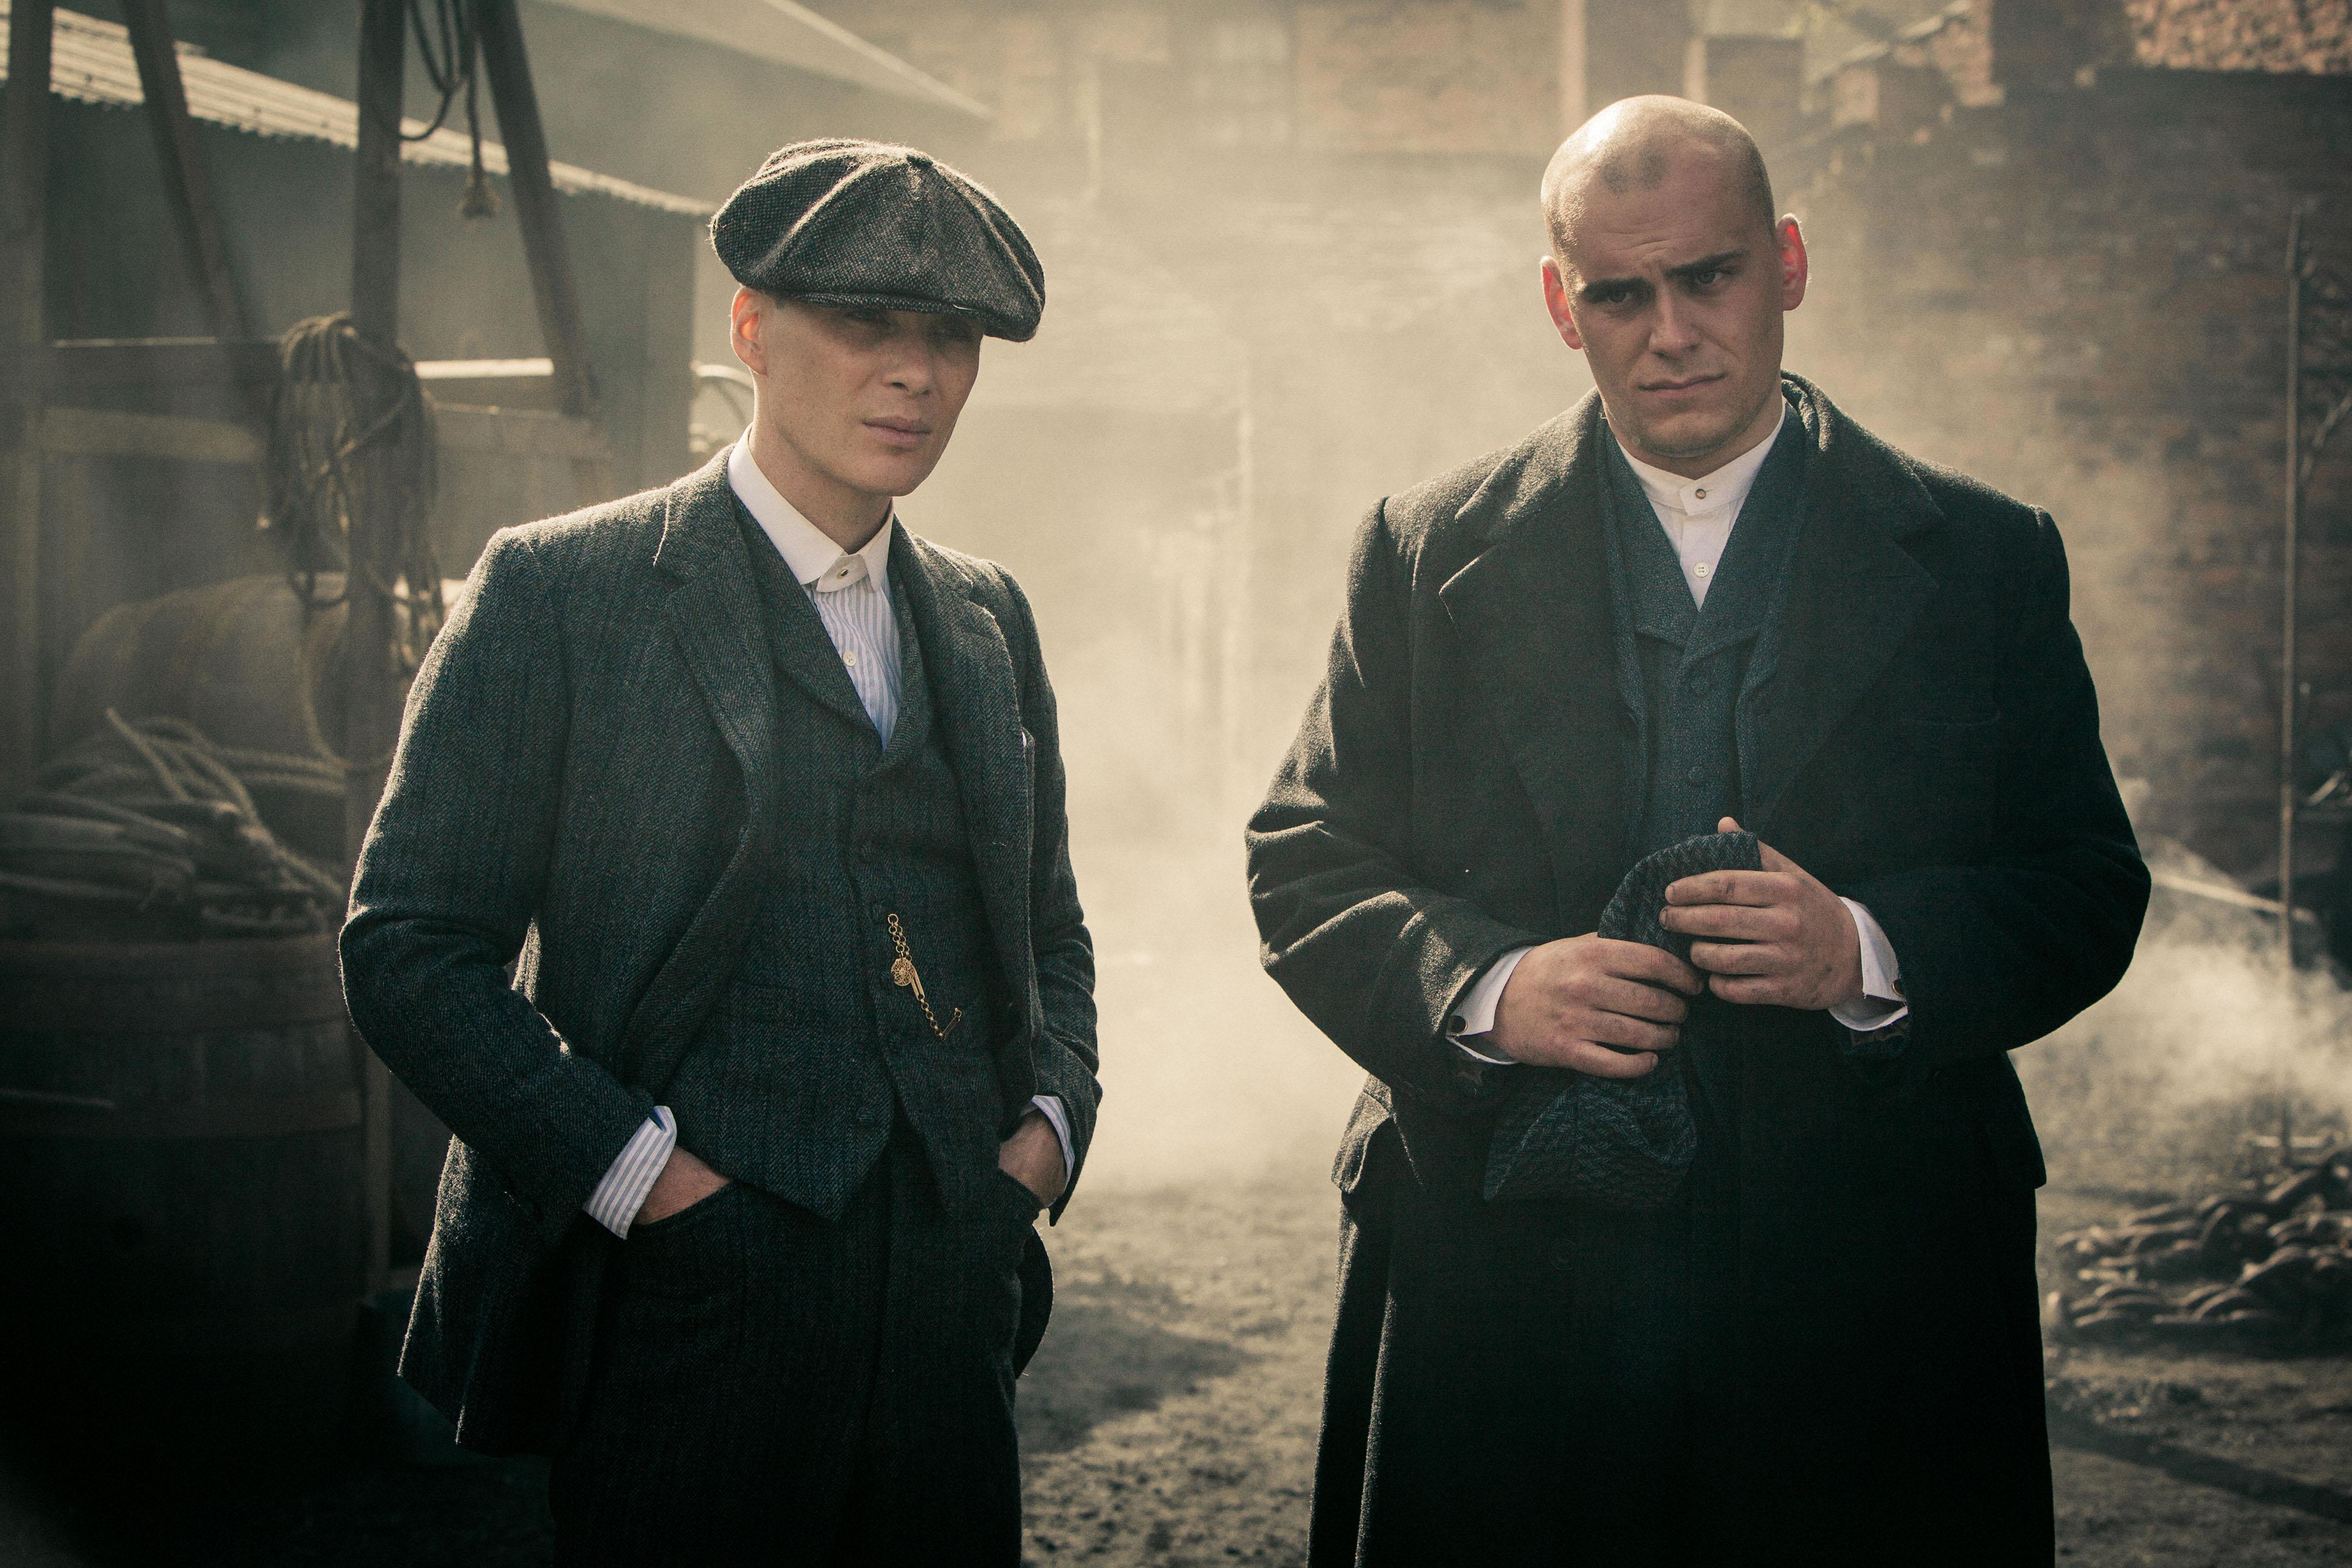 PEAKY BLINDERS, l-r: Cillian Murphy, Samuel Edward Cook, (Season 1, 2013). ©Netflix/courtesy Everett Collection